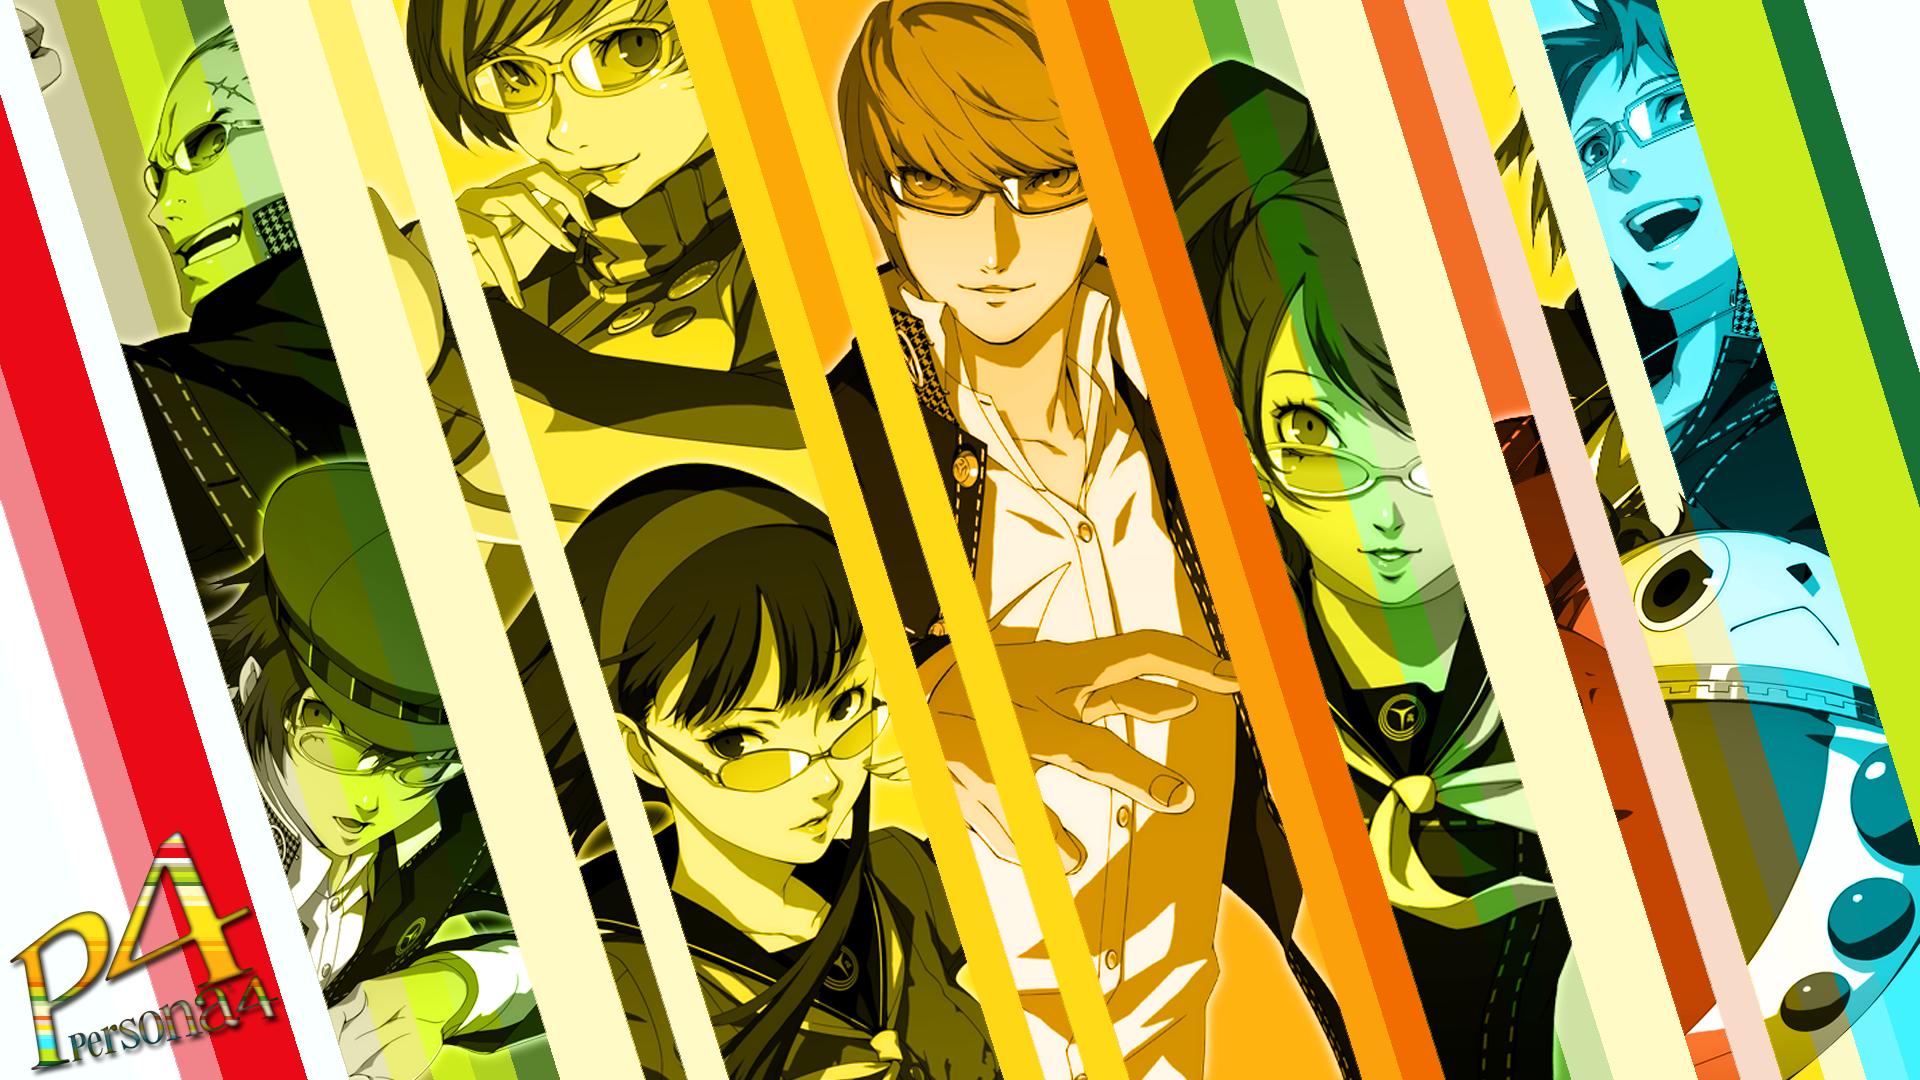 Fondos De Pantalla Persona 4 Personal 4 Arena Anime